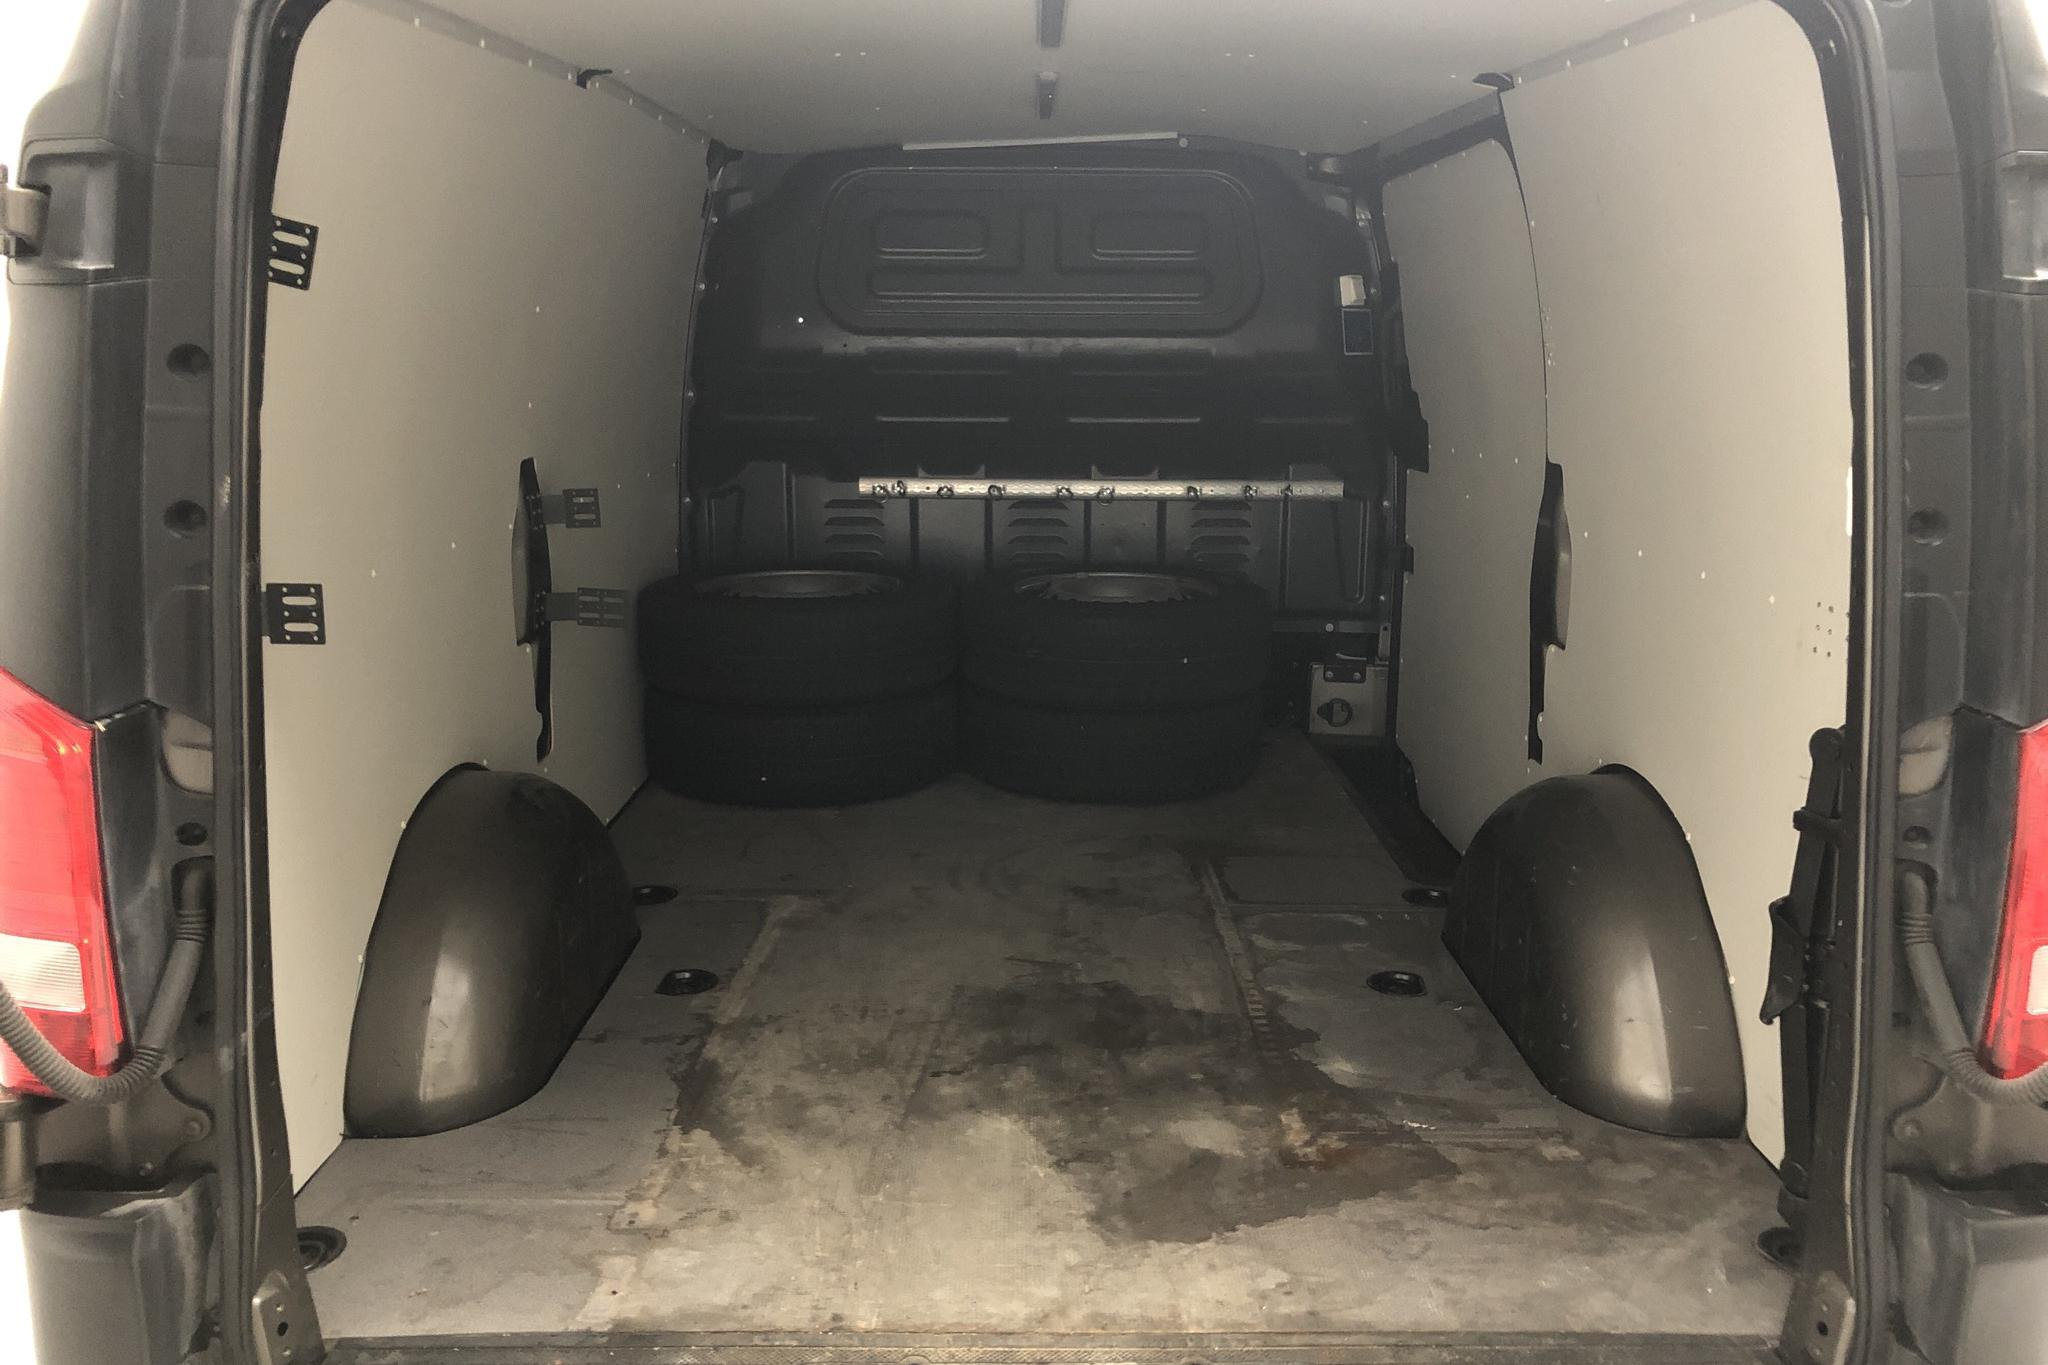 Mercedes Vito 114 CDI W640 (136hk) - 15 869 mil - Automat - grå - 2017